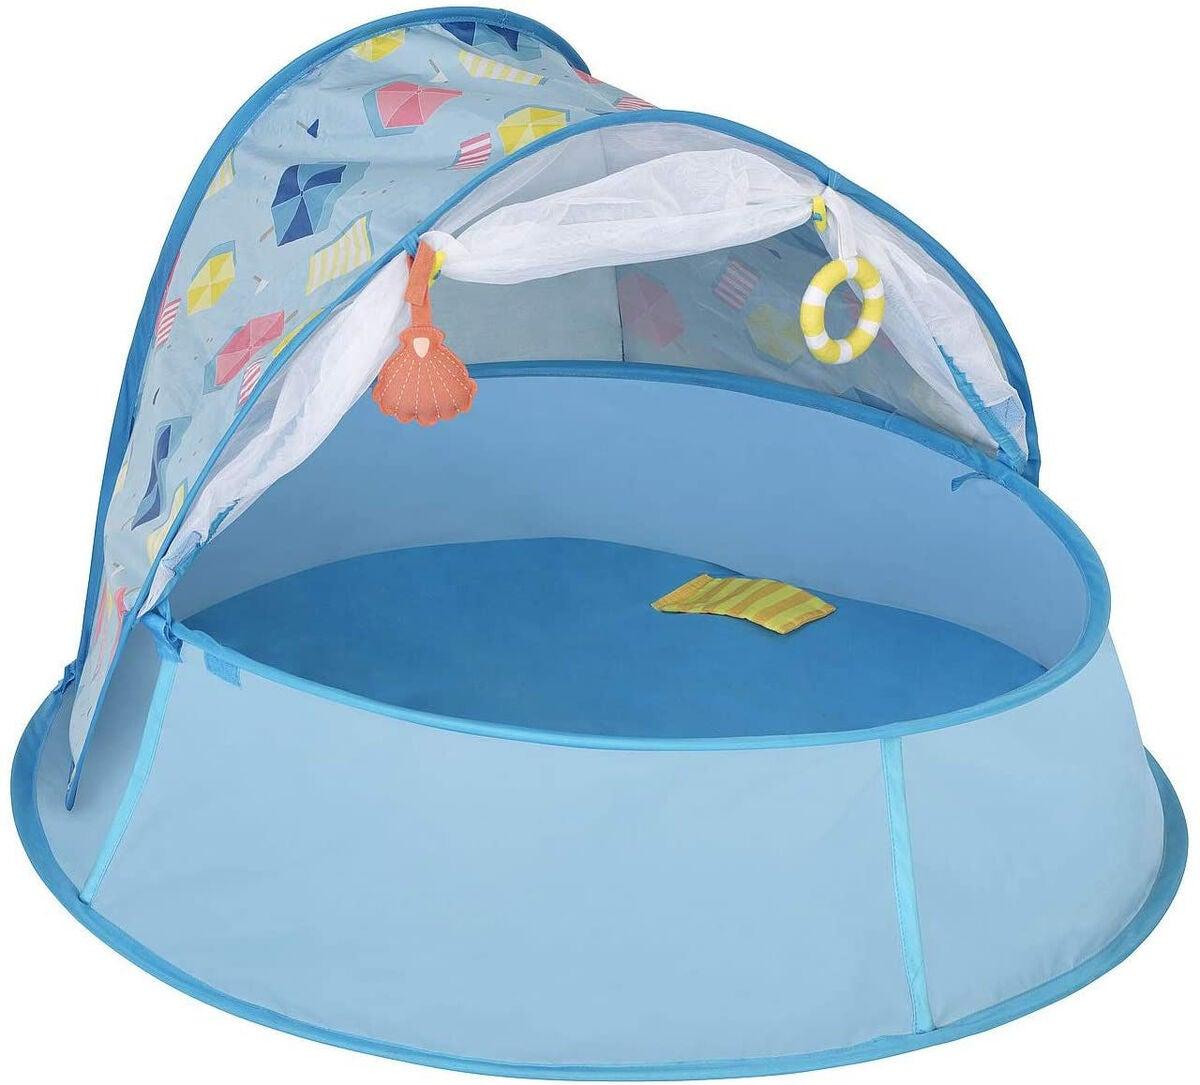 Køb Babymoov Babyni UV telt, Blå | Jollyroom